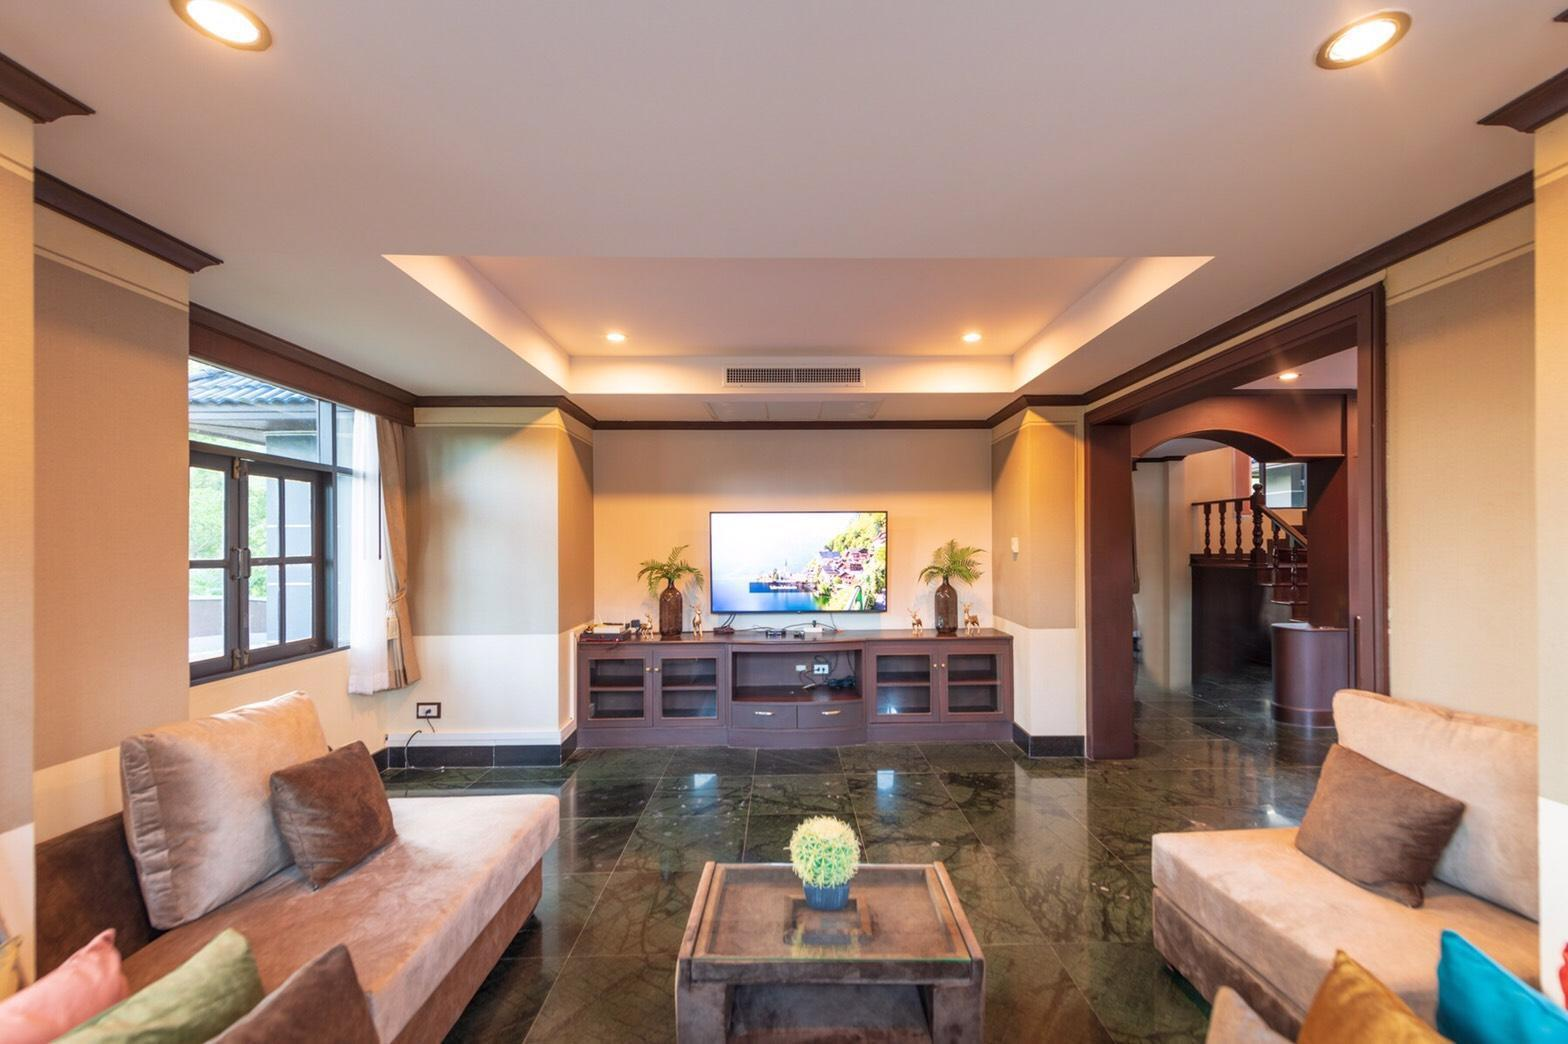 The Secret Pool Villa วิลลา 5 ห้องนอน 4 ห้องน้ำส่วนตัว ขนาด 800 ตร.ม. – บ้านทรายไทย